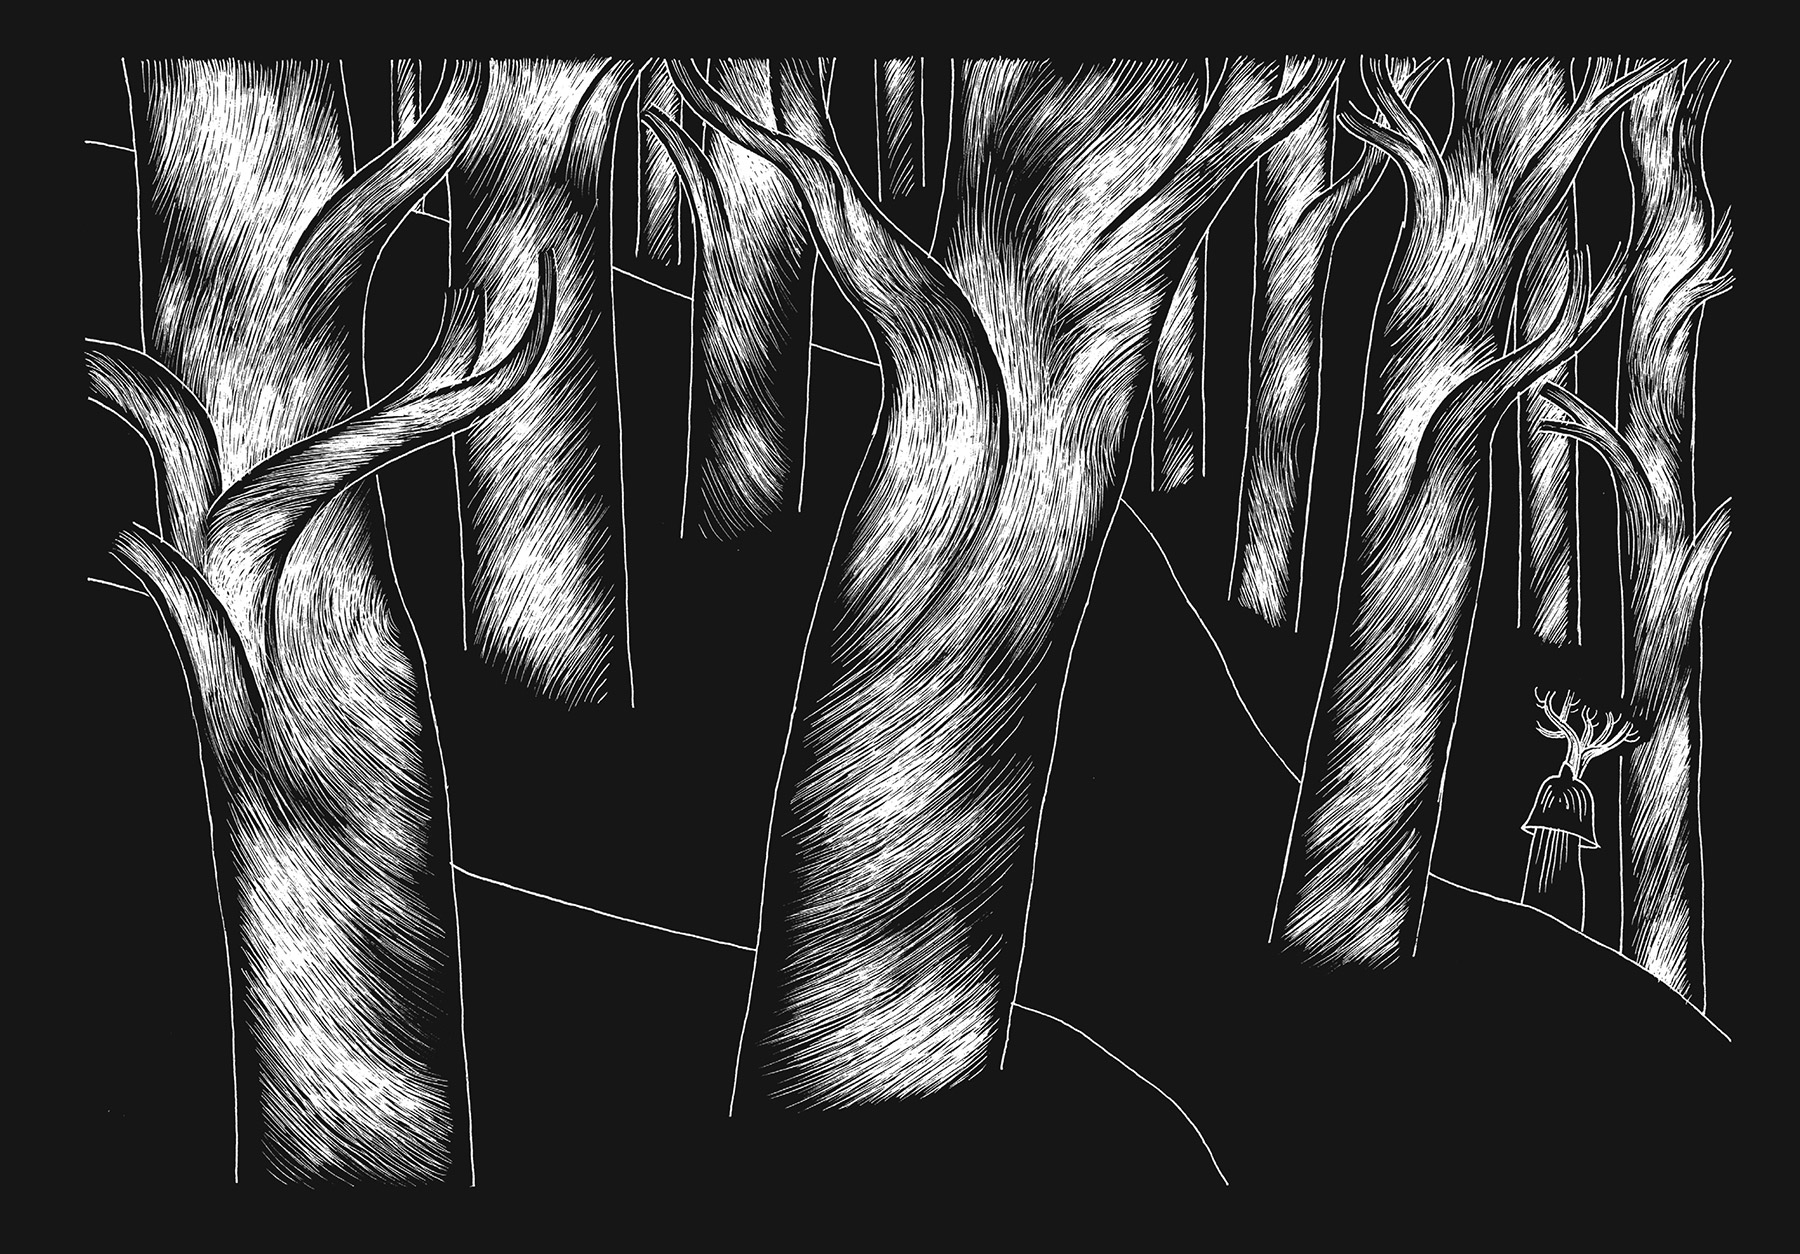 davidm-arboreal-web_expanded-4.jpg